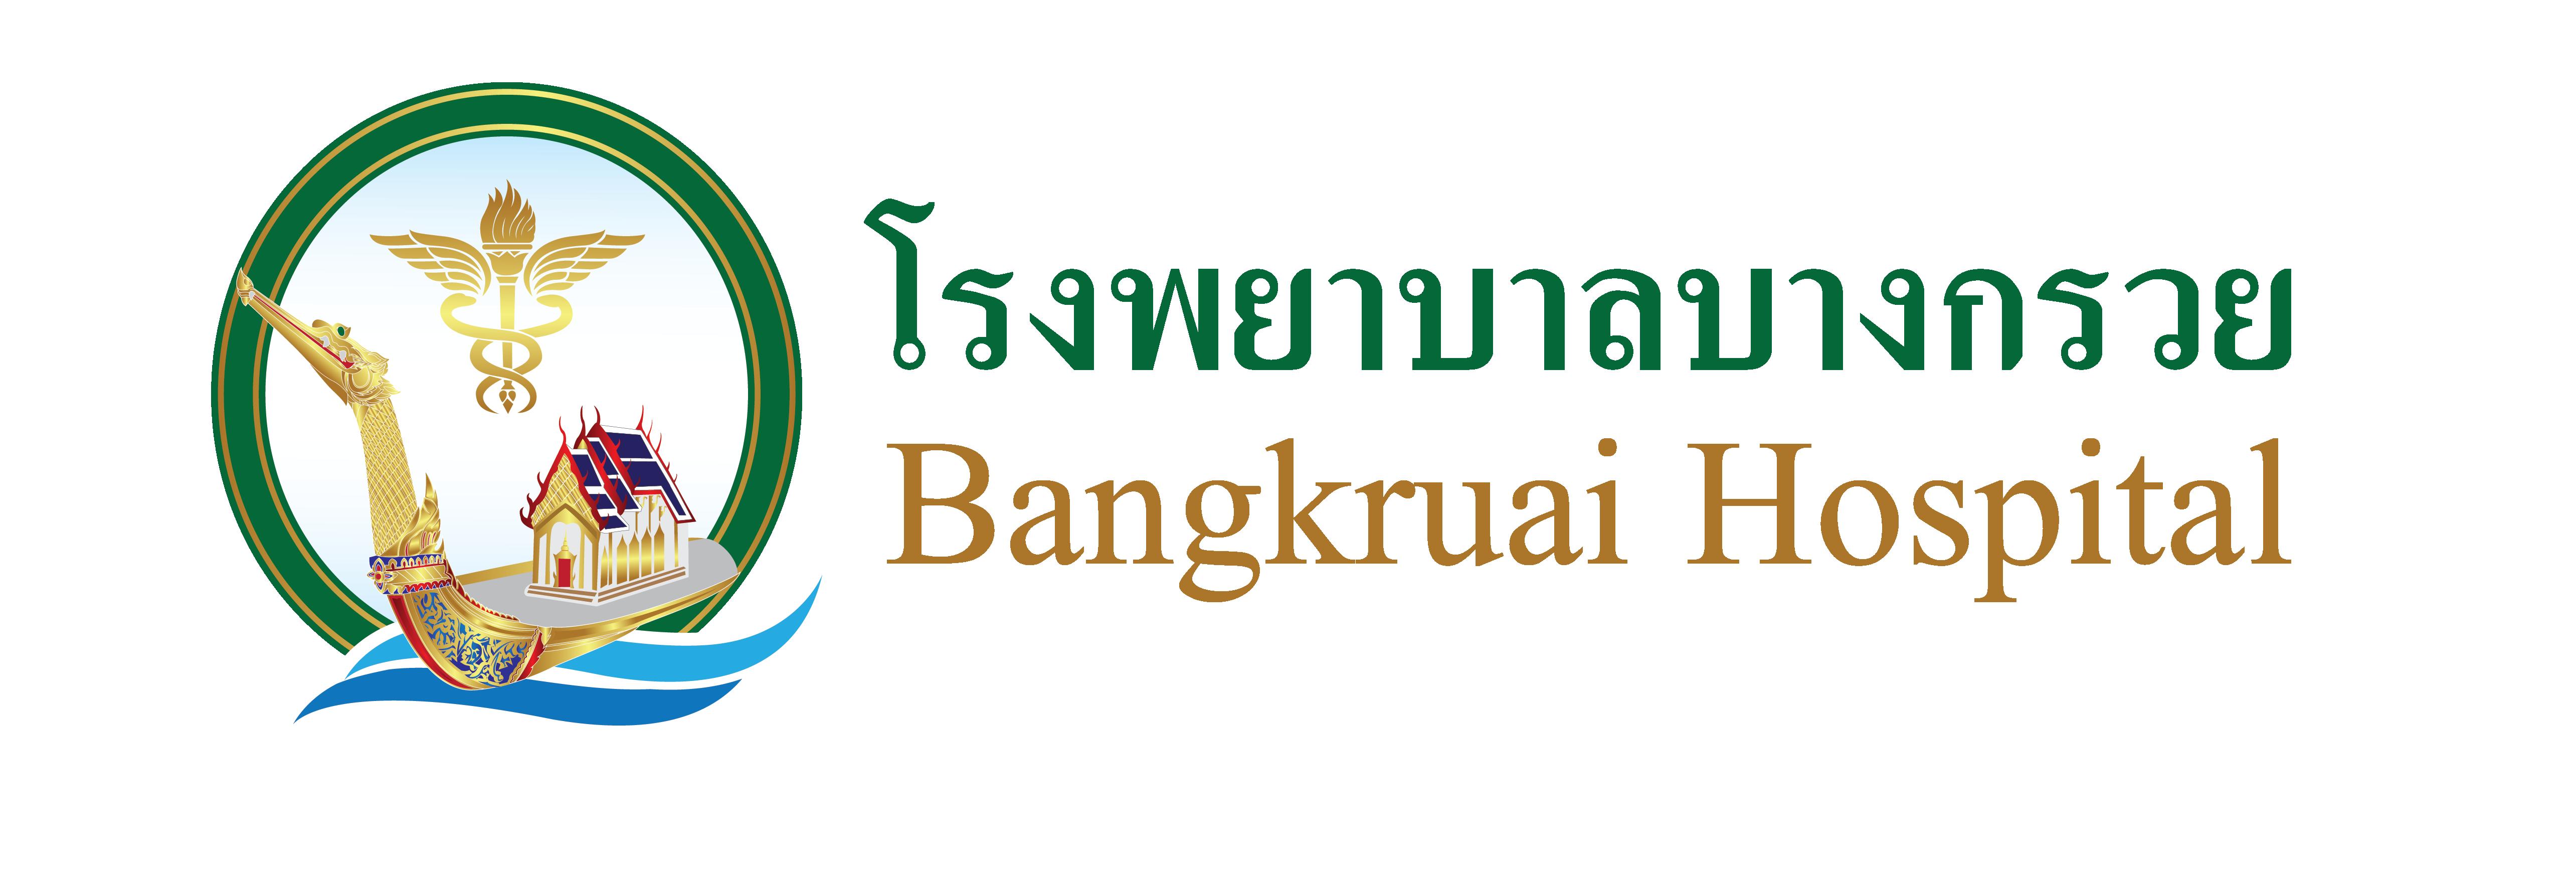 Bangkruai Hospital